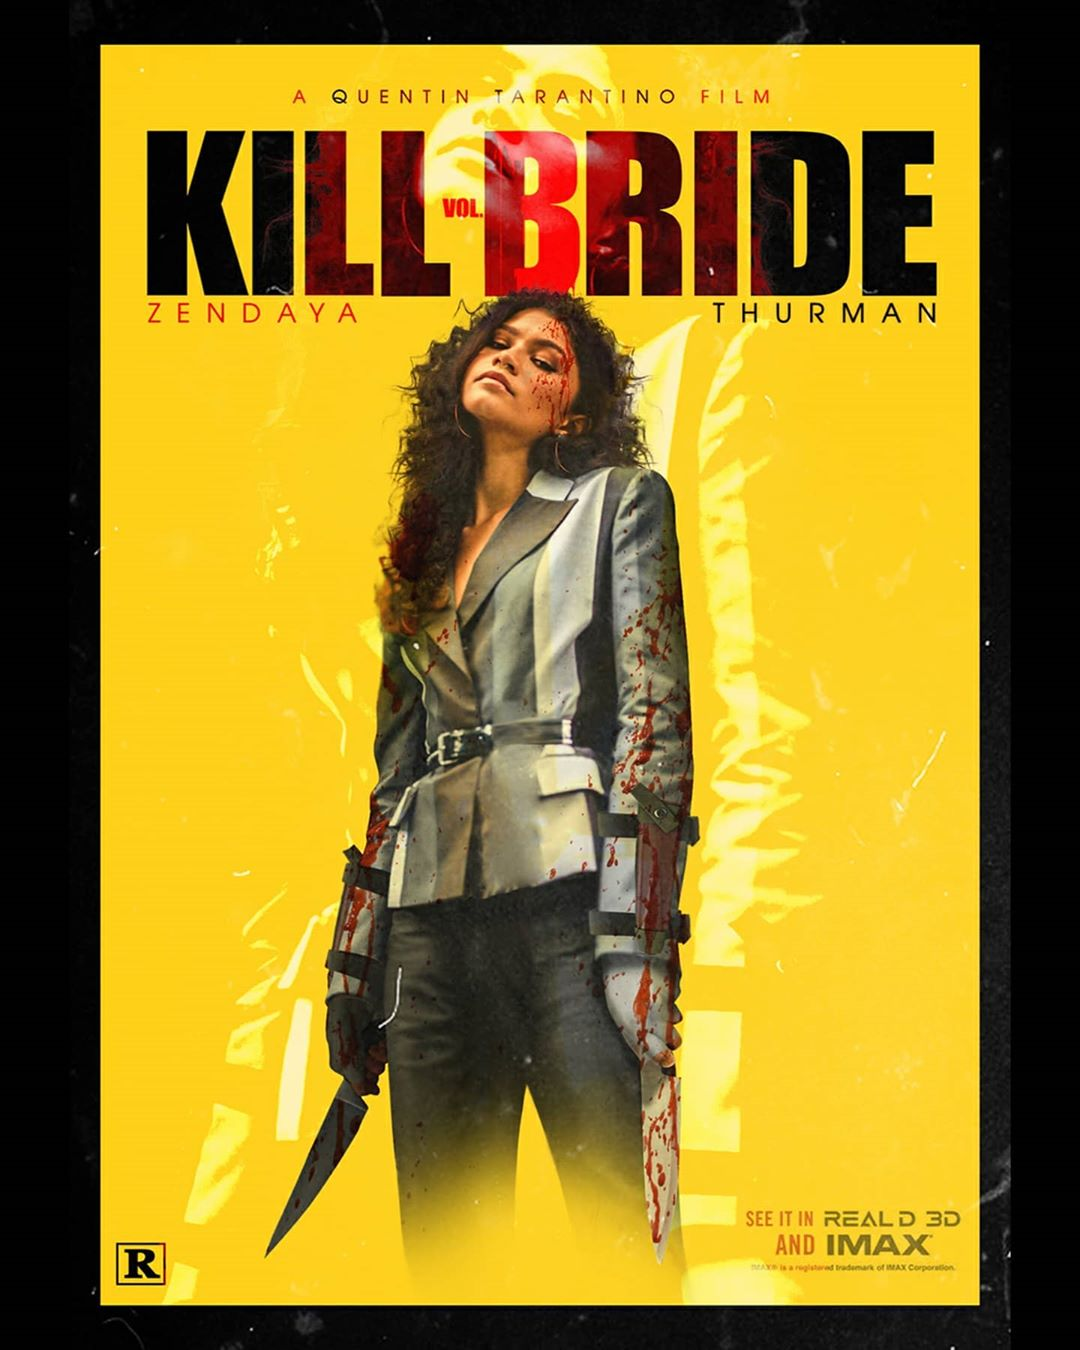 Zendaya Kill Bill